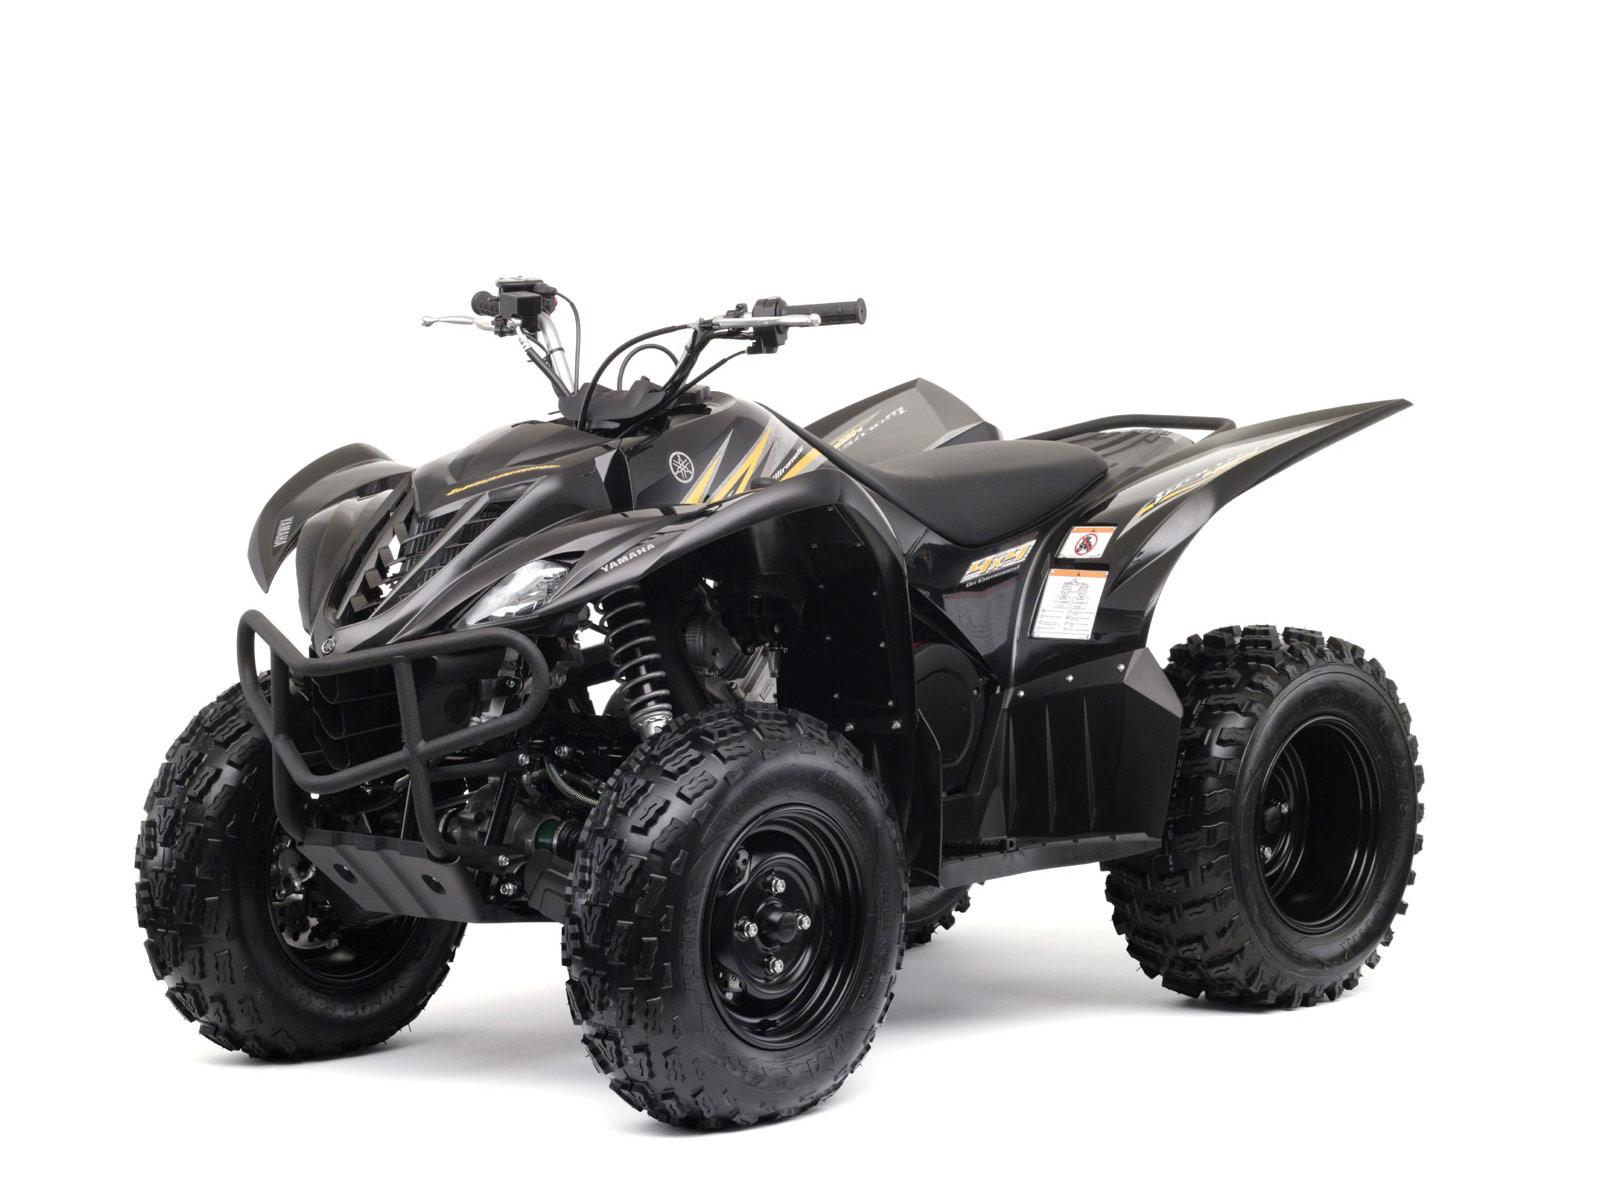 Yamaha Wolverine  Specifications